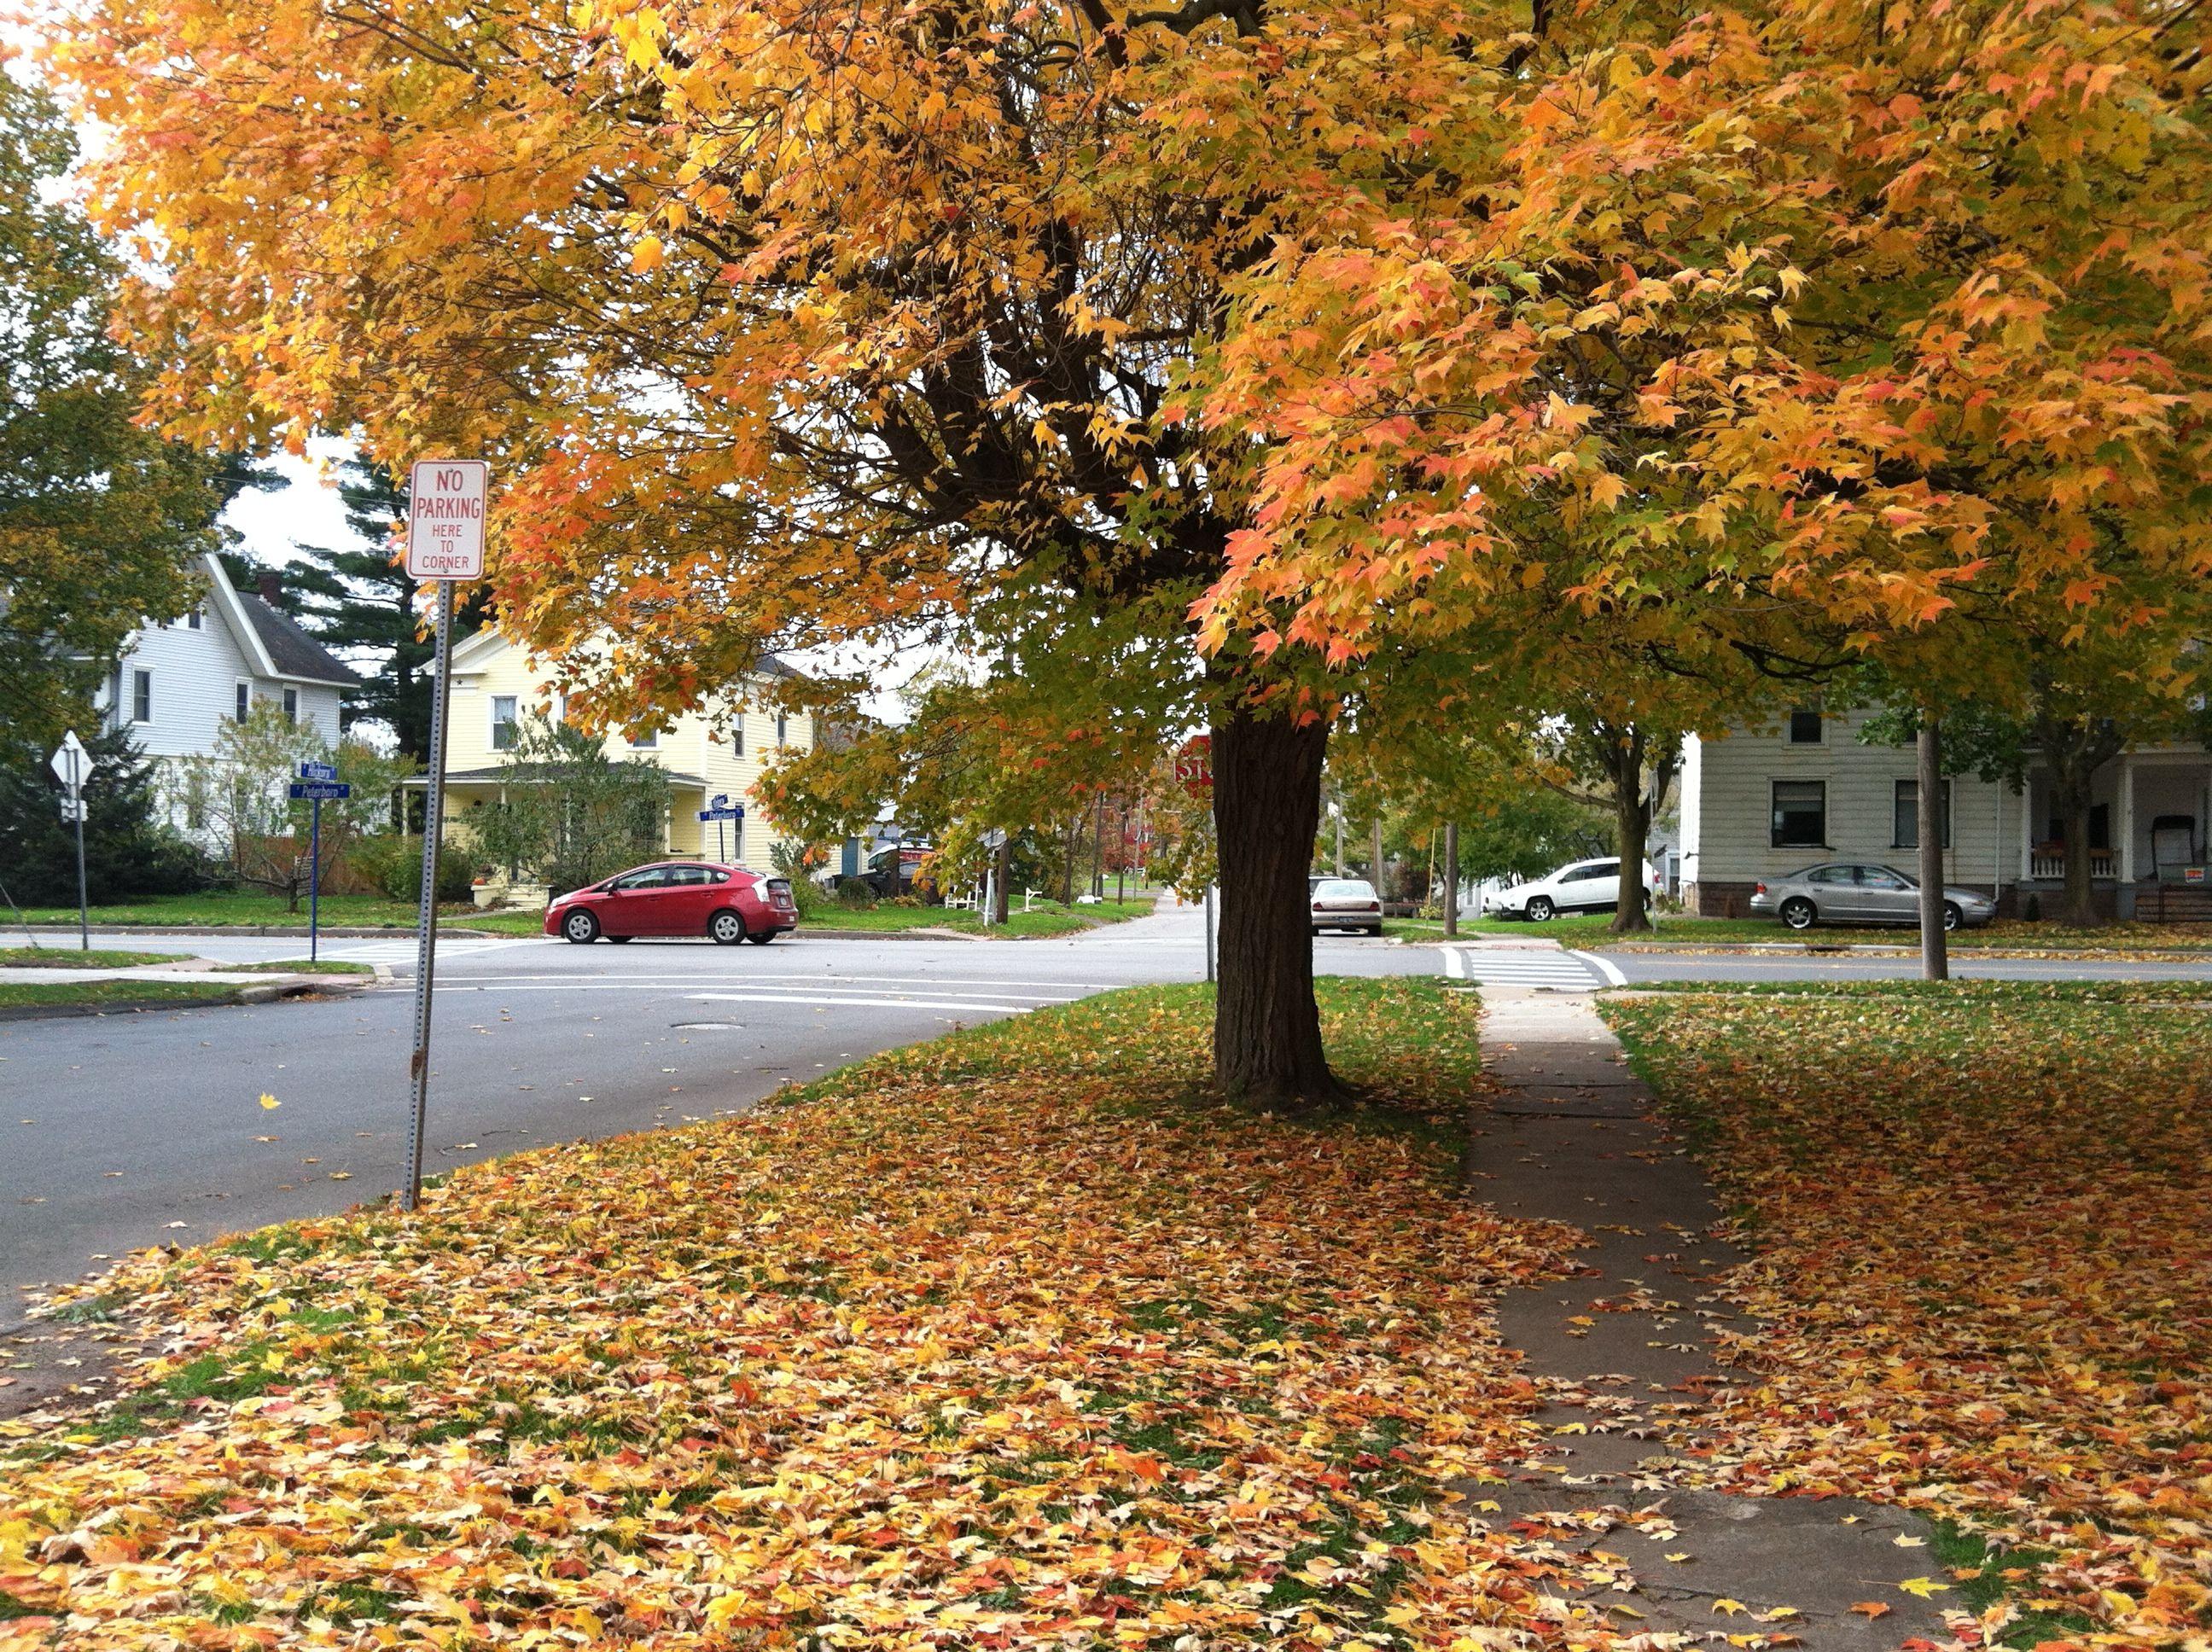 Fall in the hood